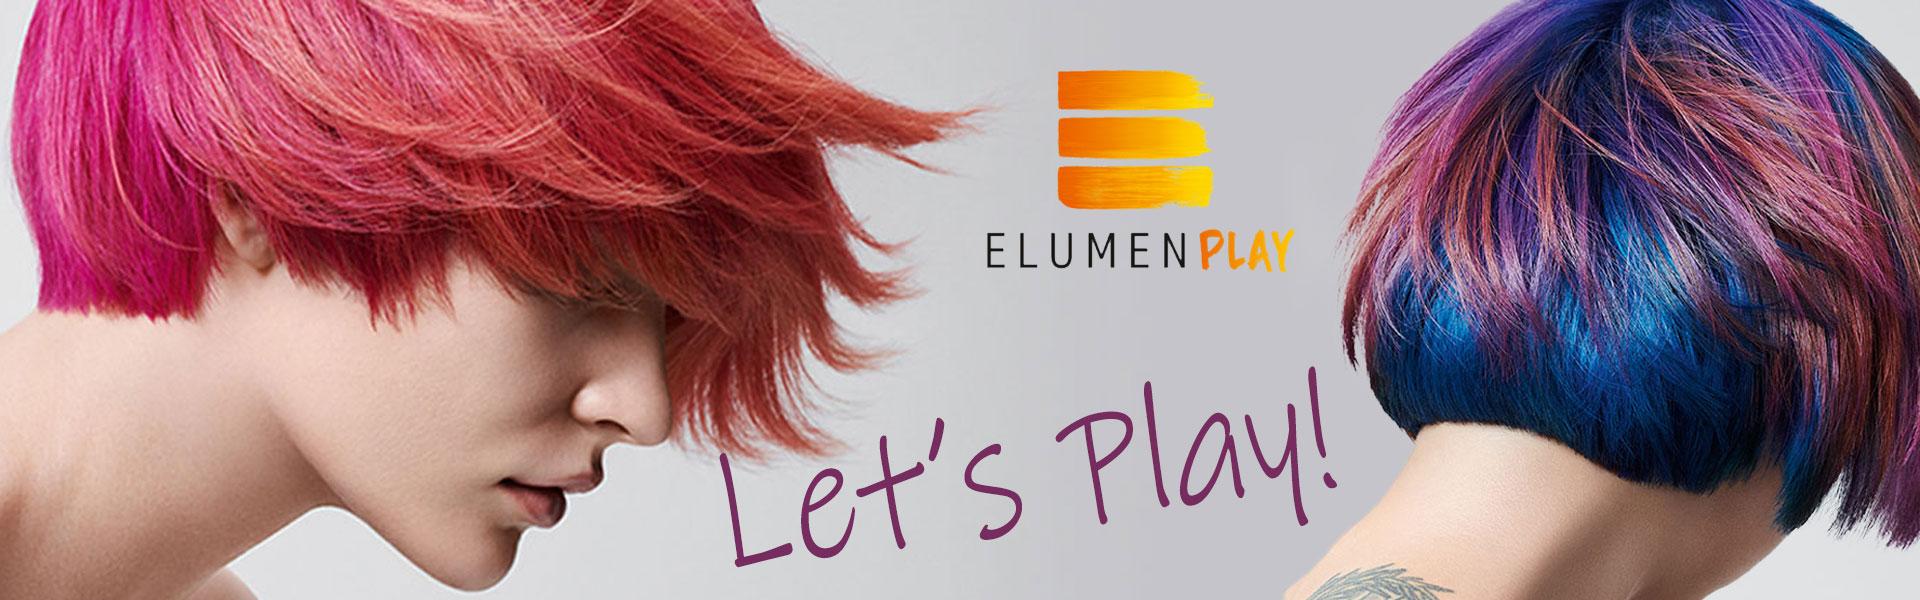 elumen-play-banner3